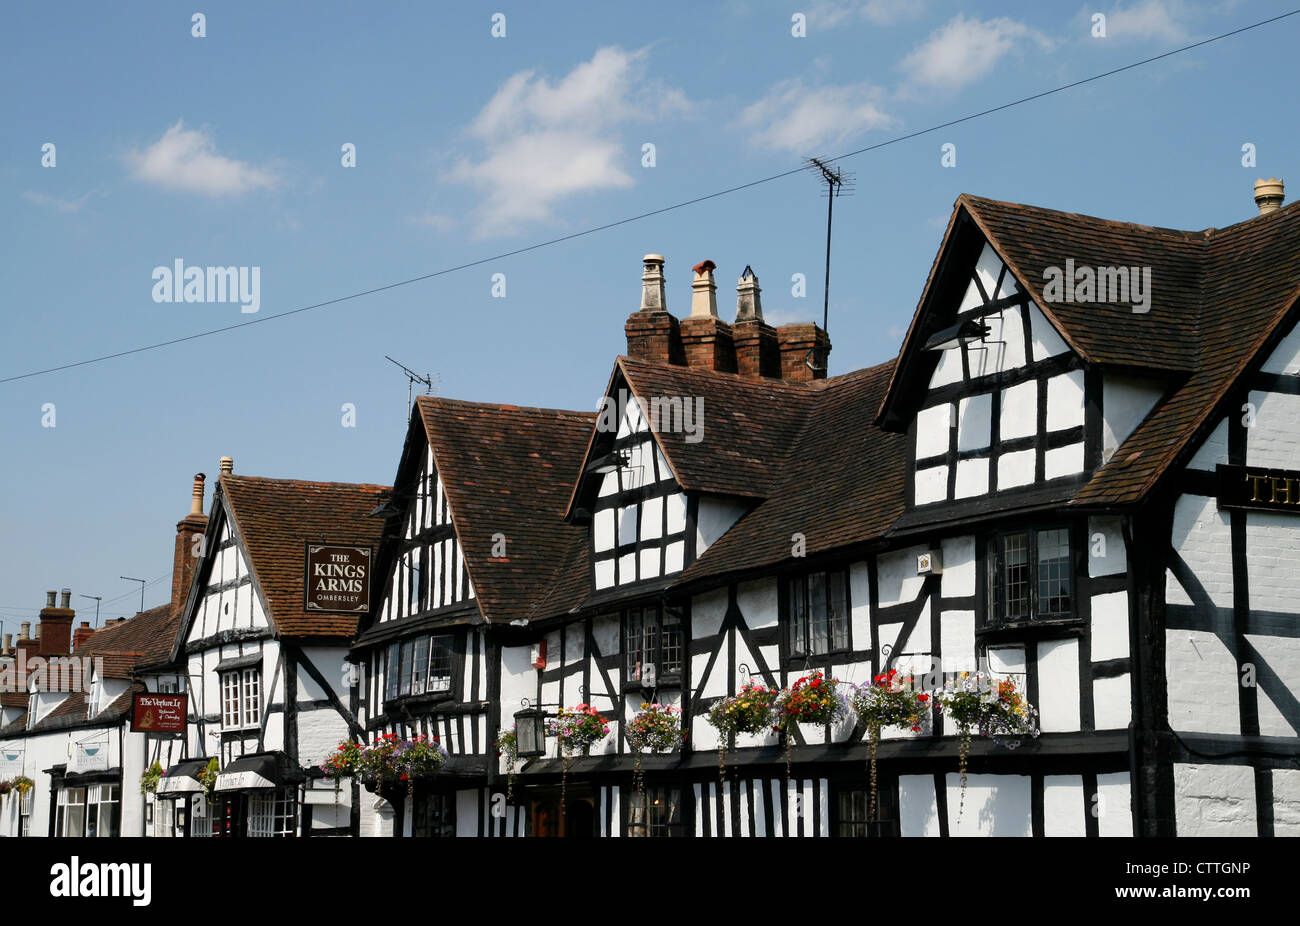 Fifteenth century Kings Arms Hotel Ombersley Worcestershire England UK - Stock Image